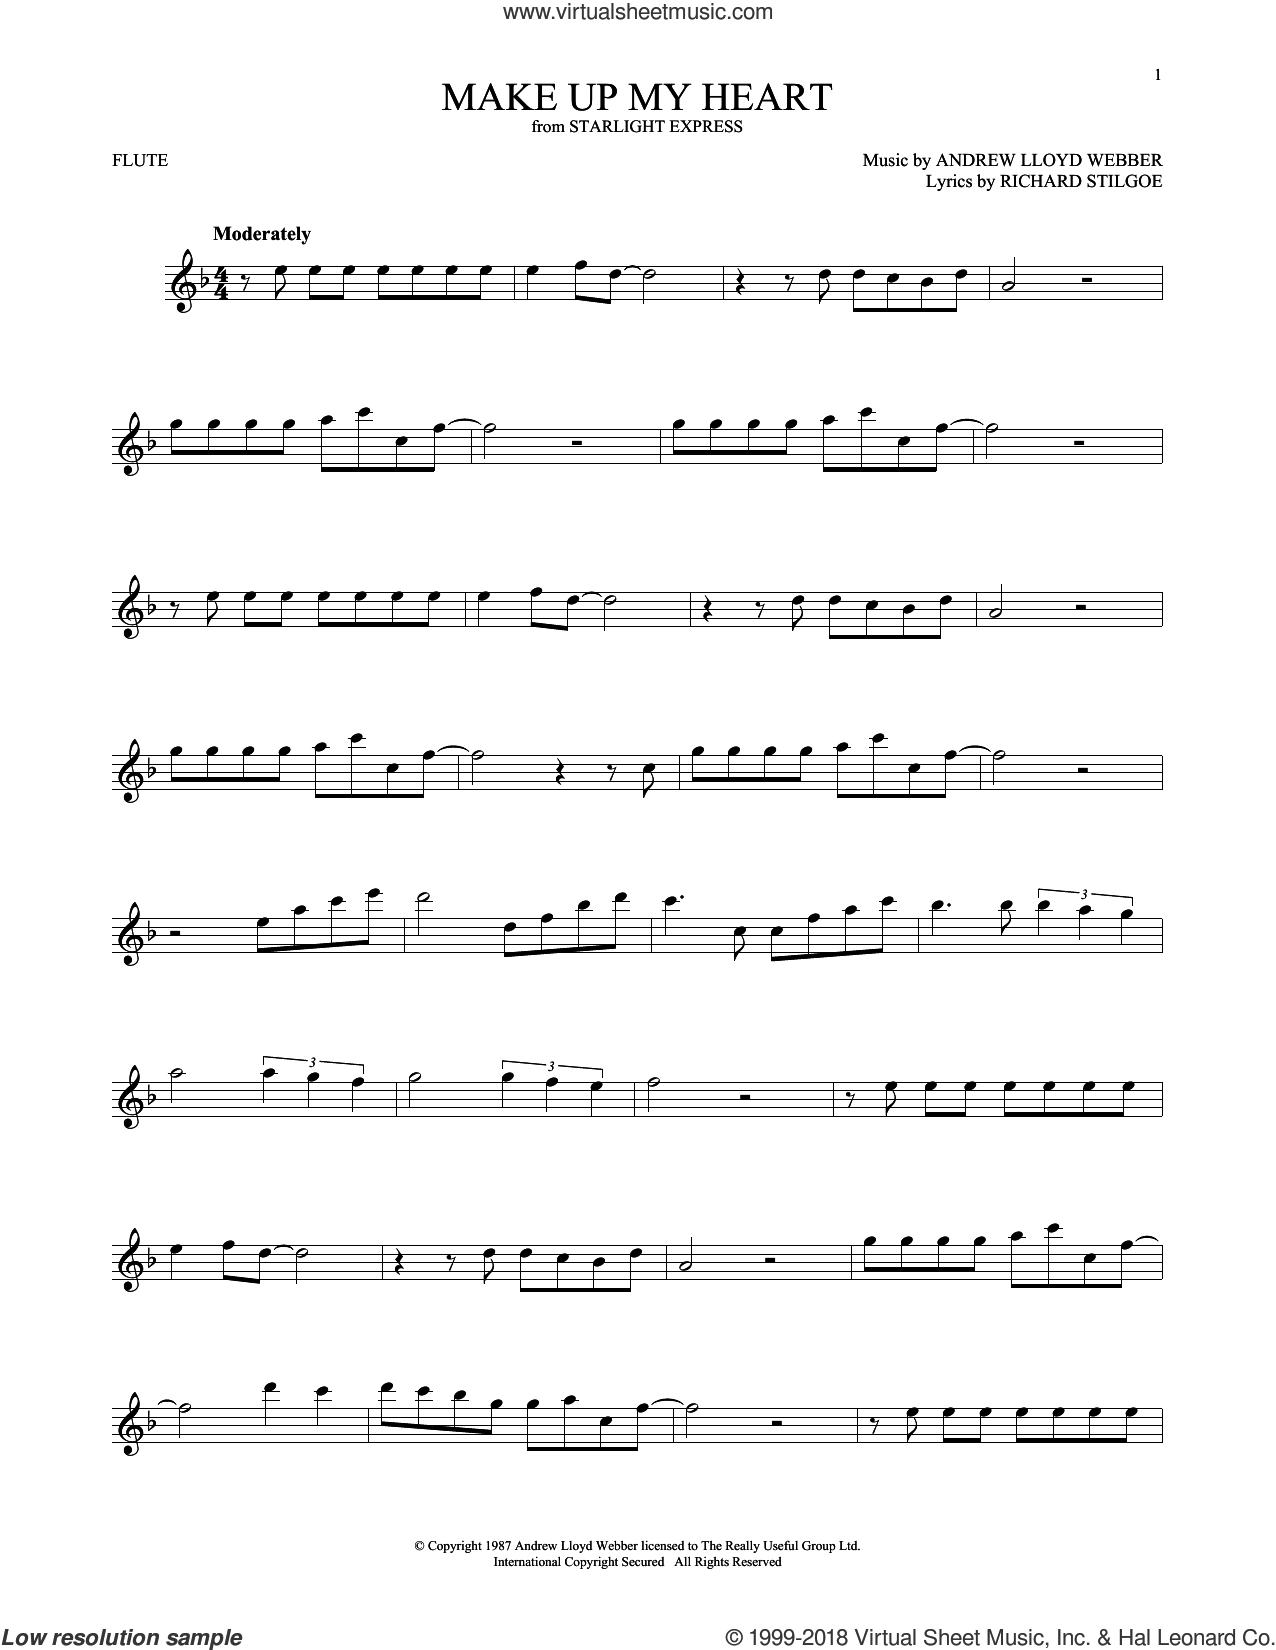 Make Up My Heart sheet music for flute solo by Andrew Lloyd Webber and Richard Stilgoe, intermediate skill level